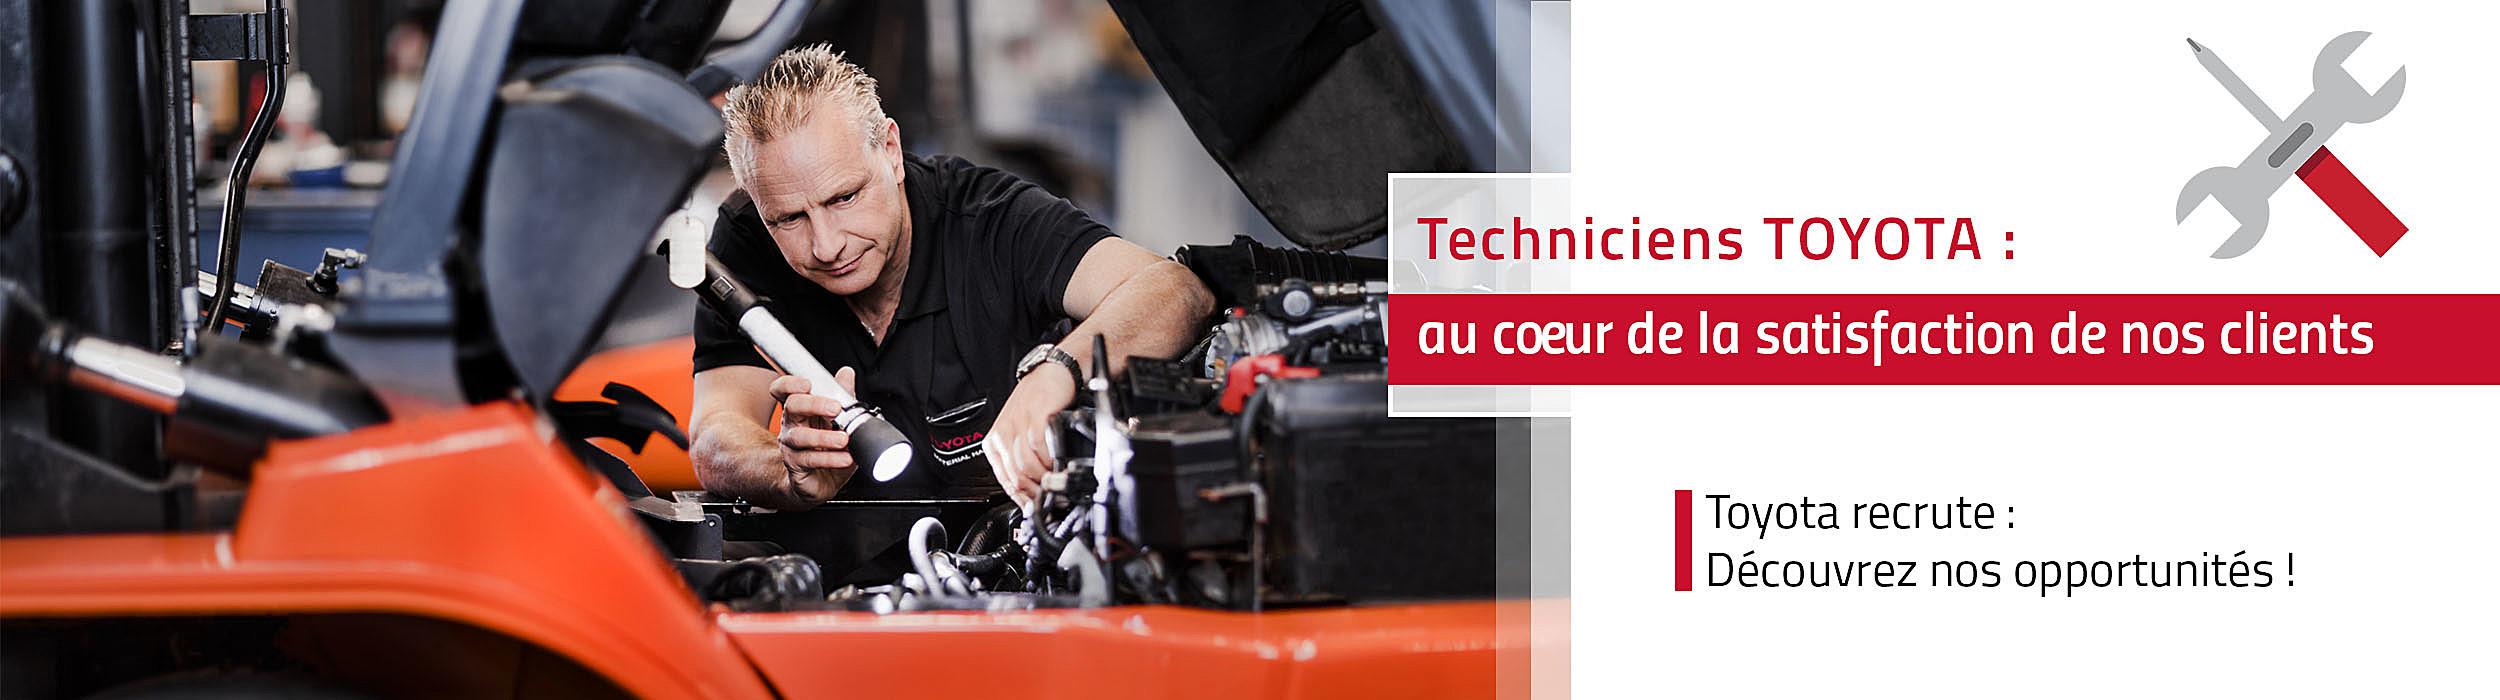 Toyota recrute des Techniciens SAV